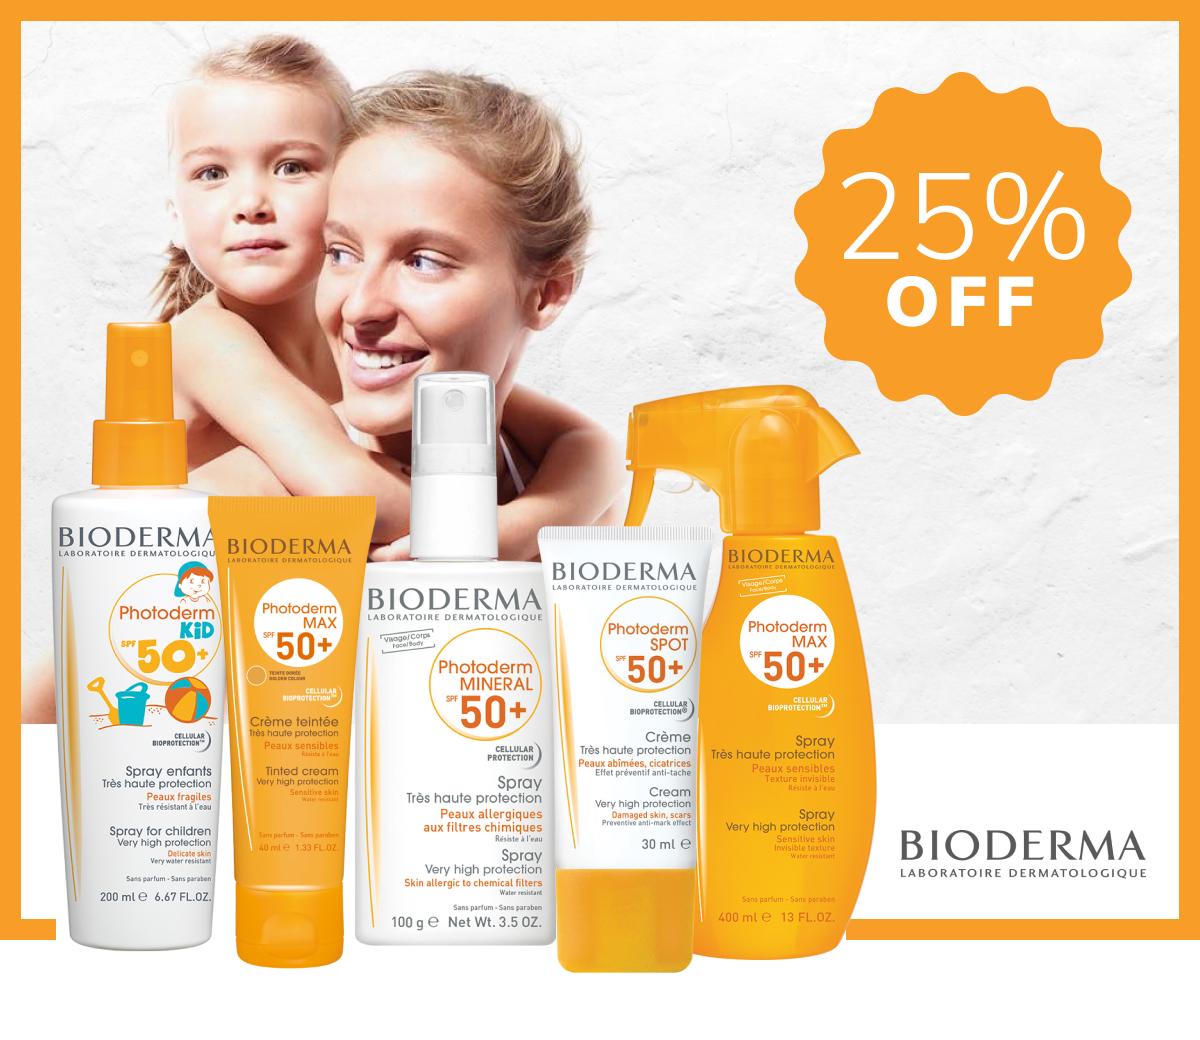 Bioderma Sunscreens